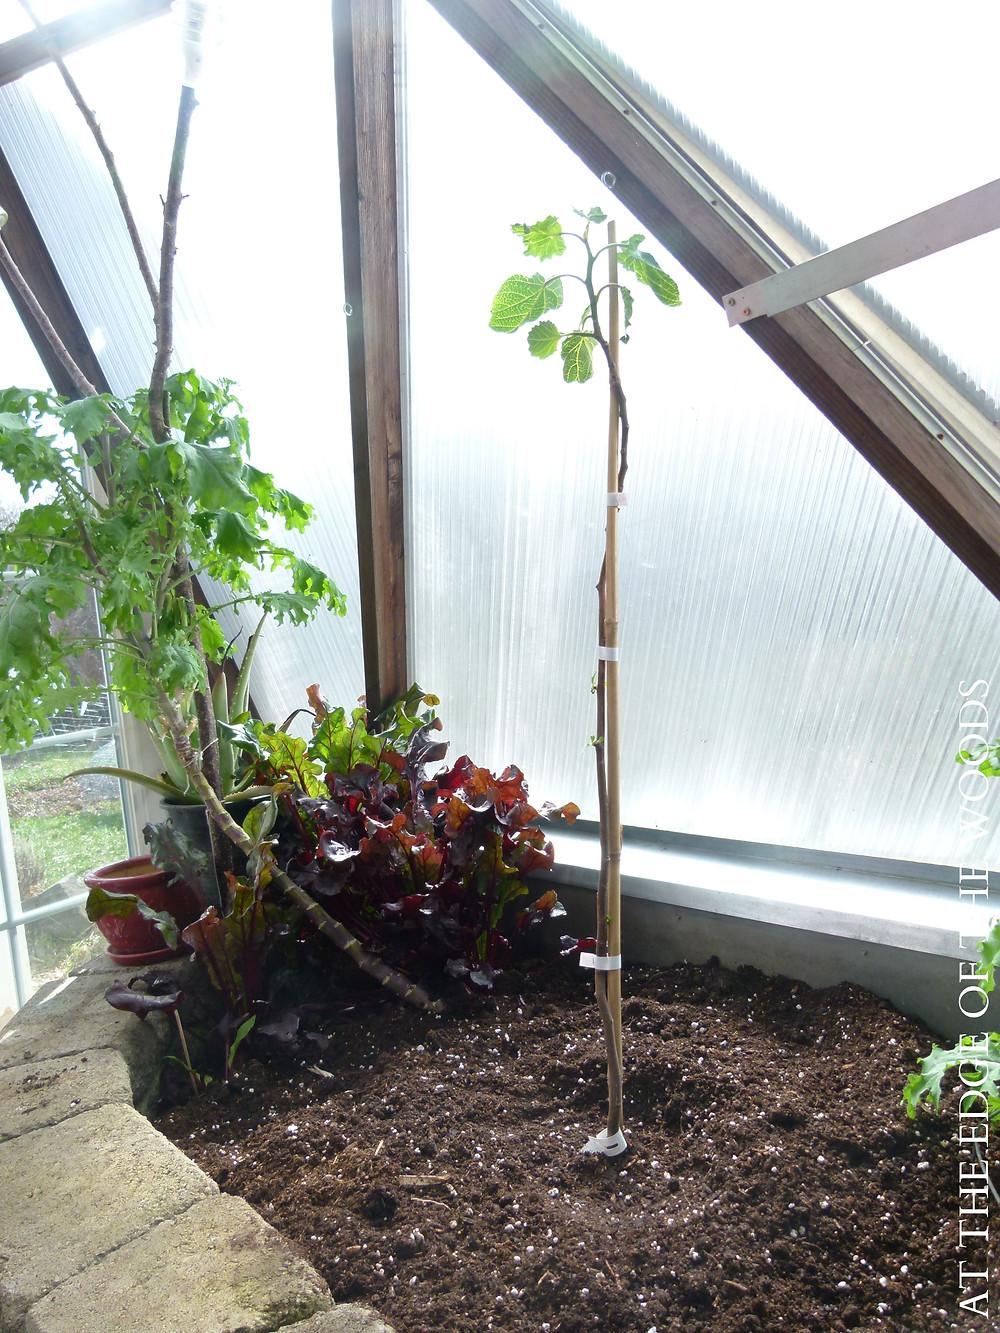 a Violette de Bordeaux fig tree in the greenhouse